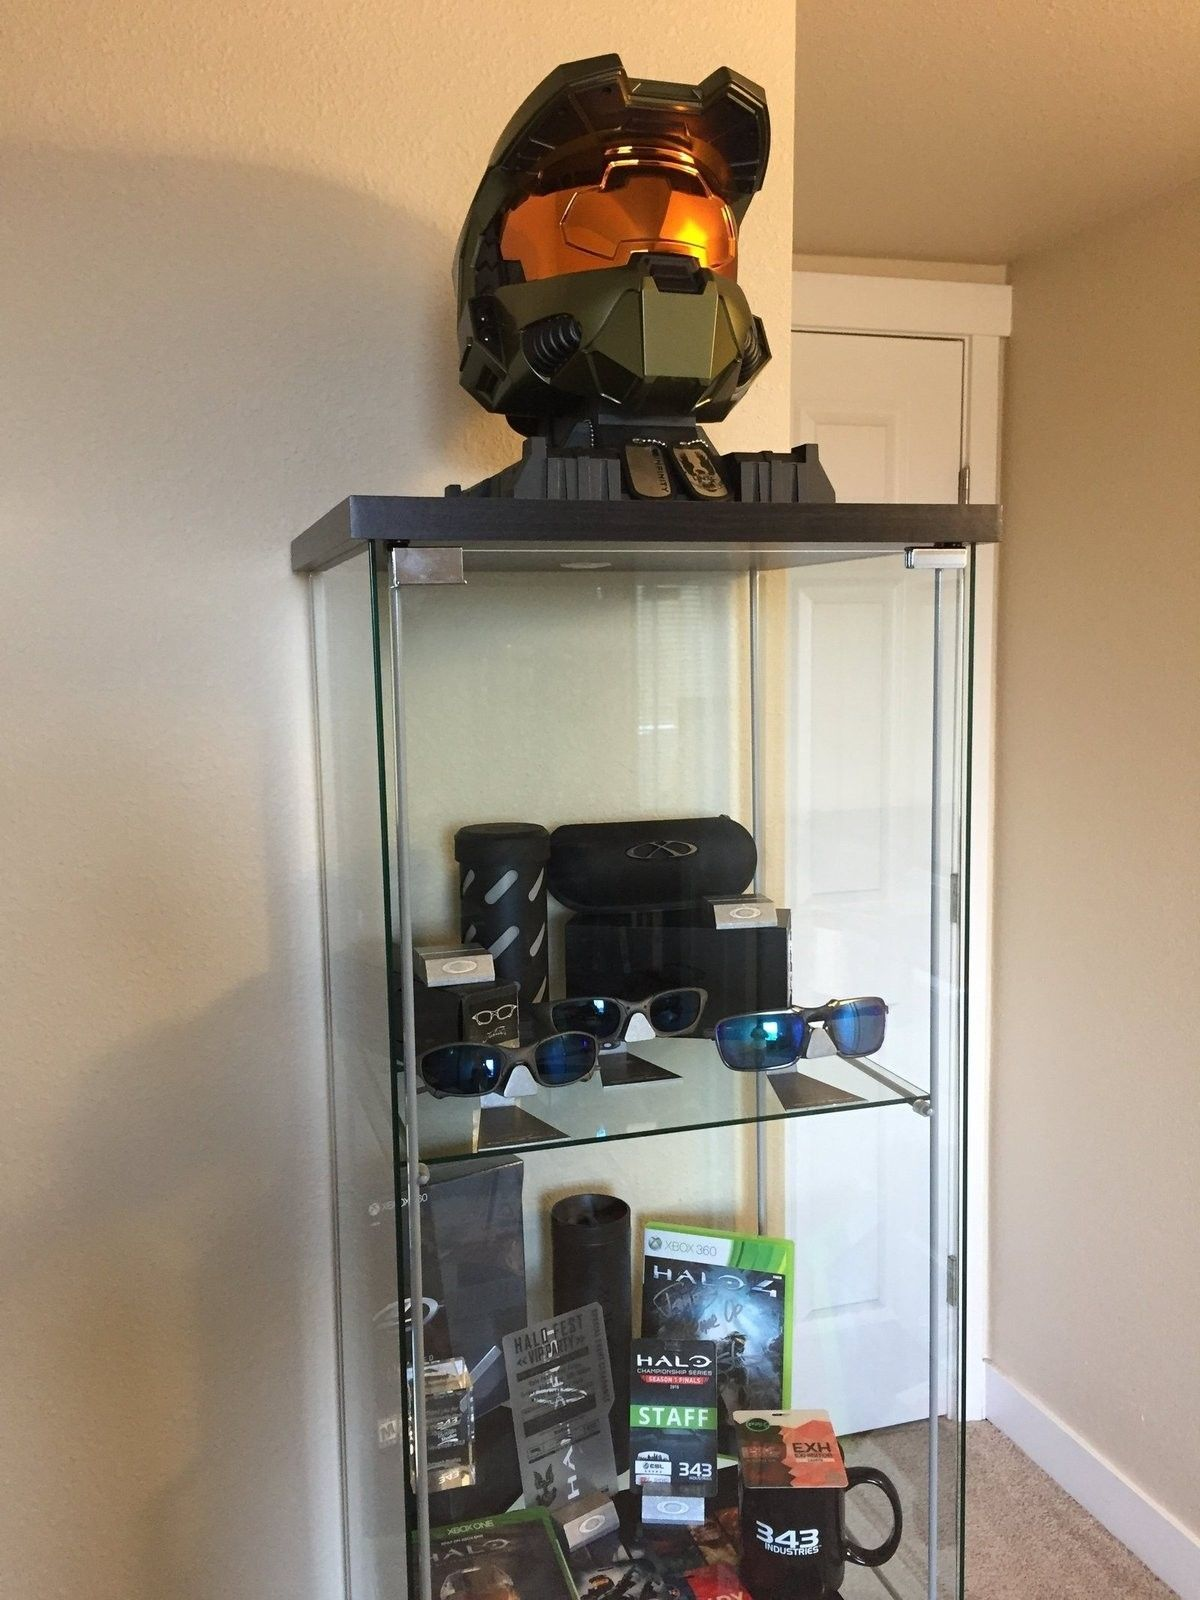 My First Display Case (Ikea) - 1.JPG